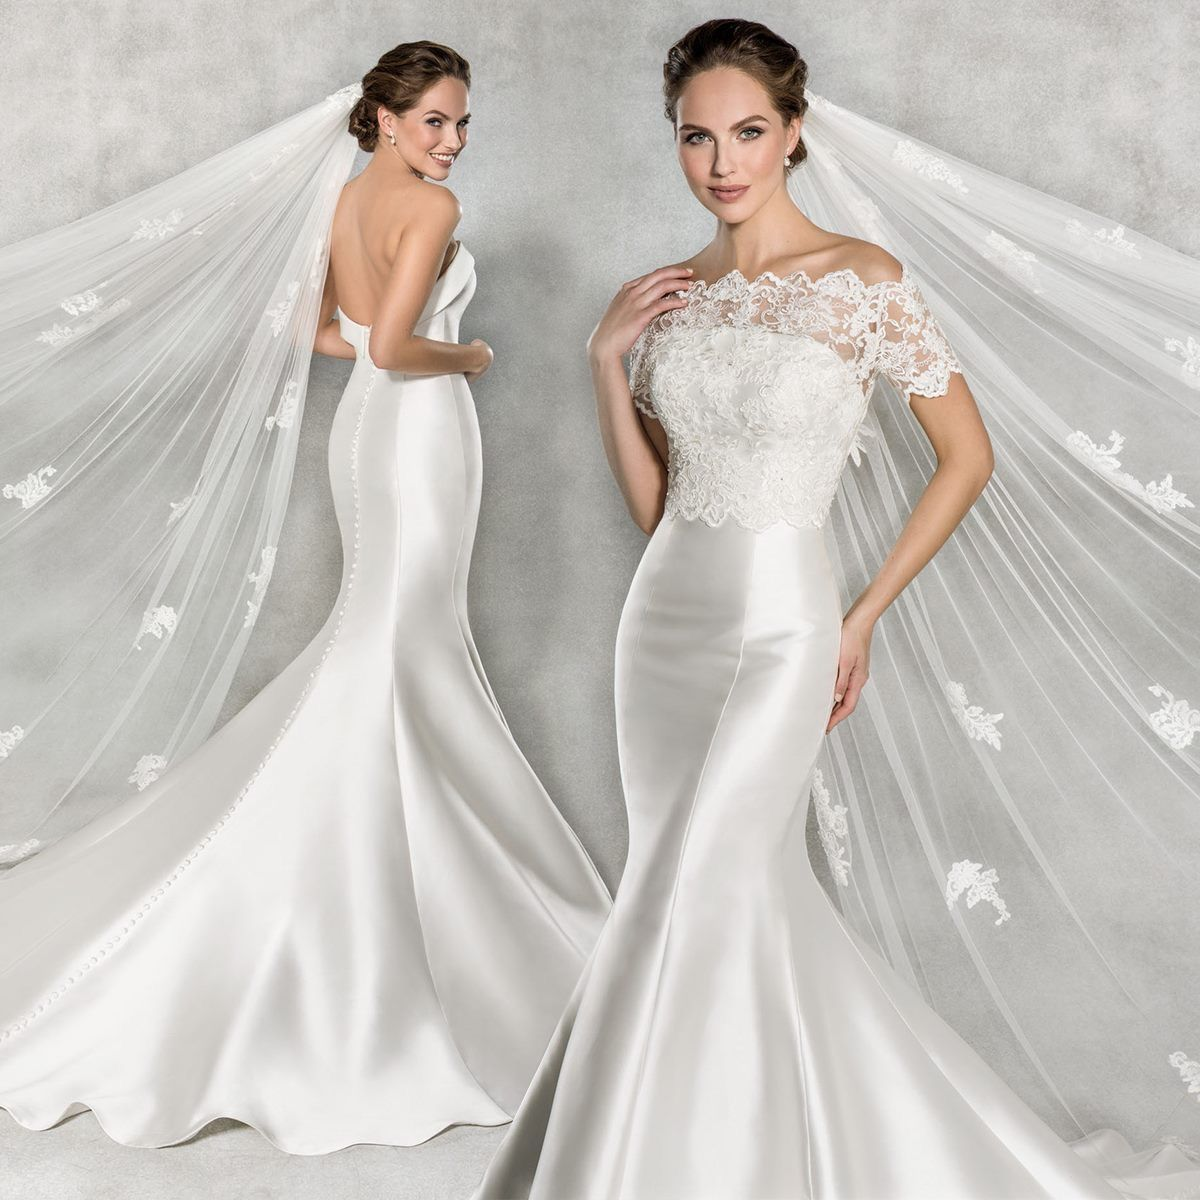 Amore Wed2b Mermaid Wedding Dressesbridesmaid